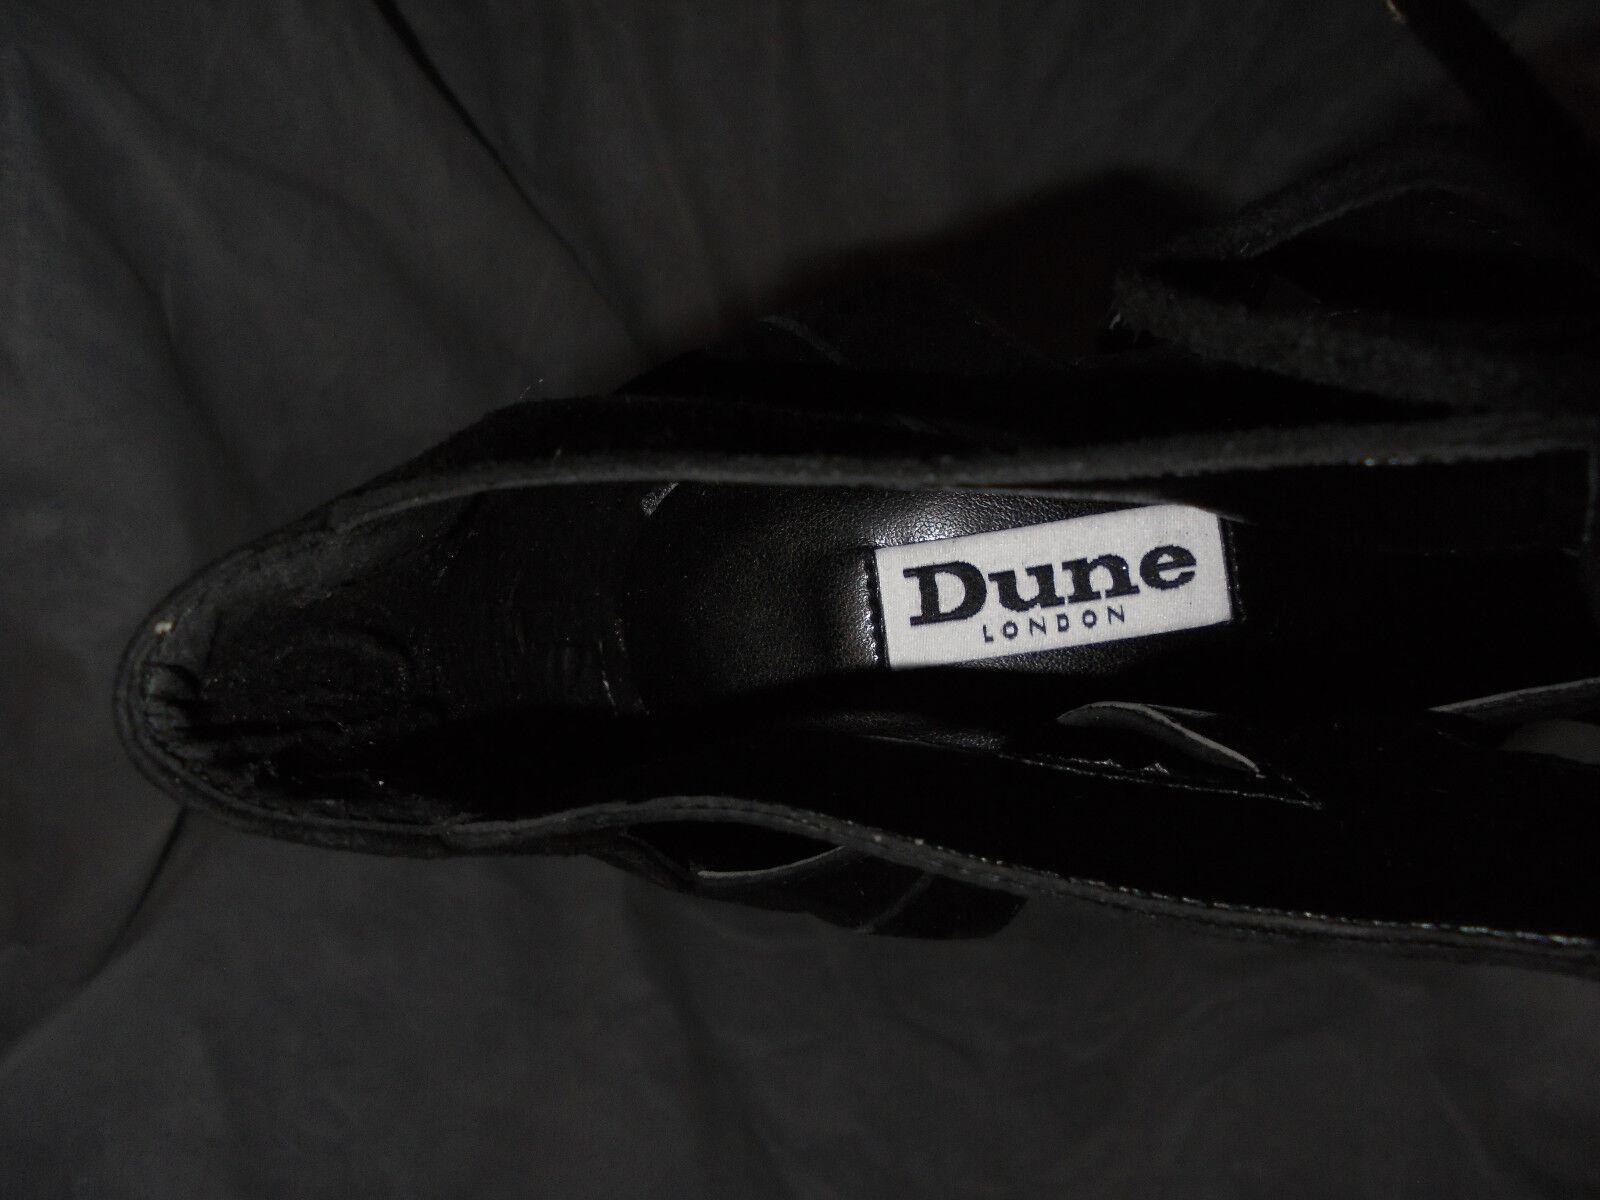 Caparros Ellen Strass Sandali Strappy Dress, raso nero, 5.5 5.5 nero, UK 321e77